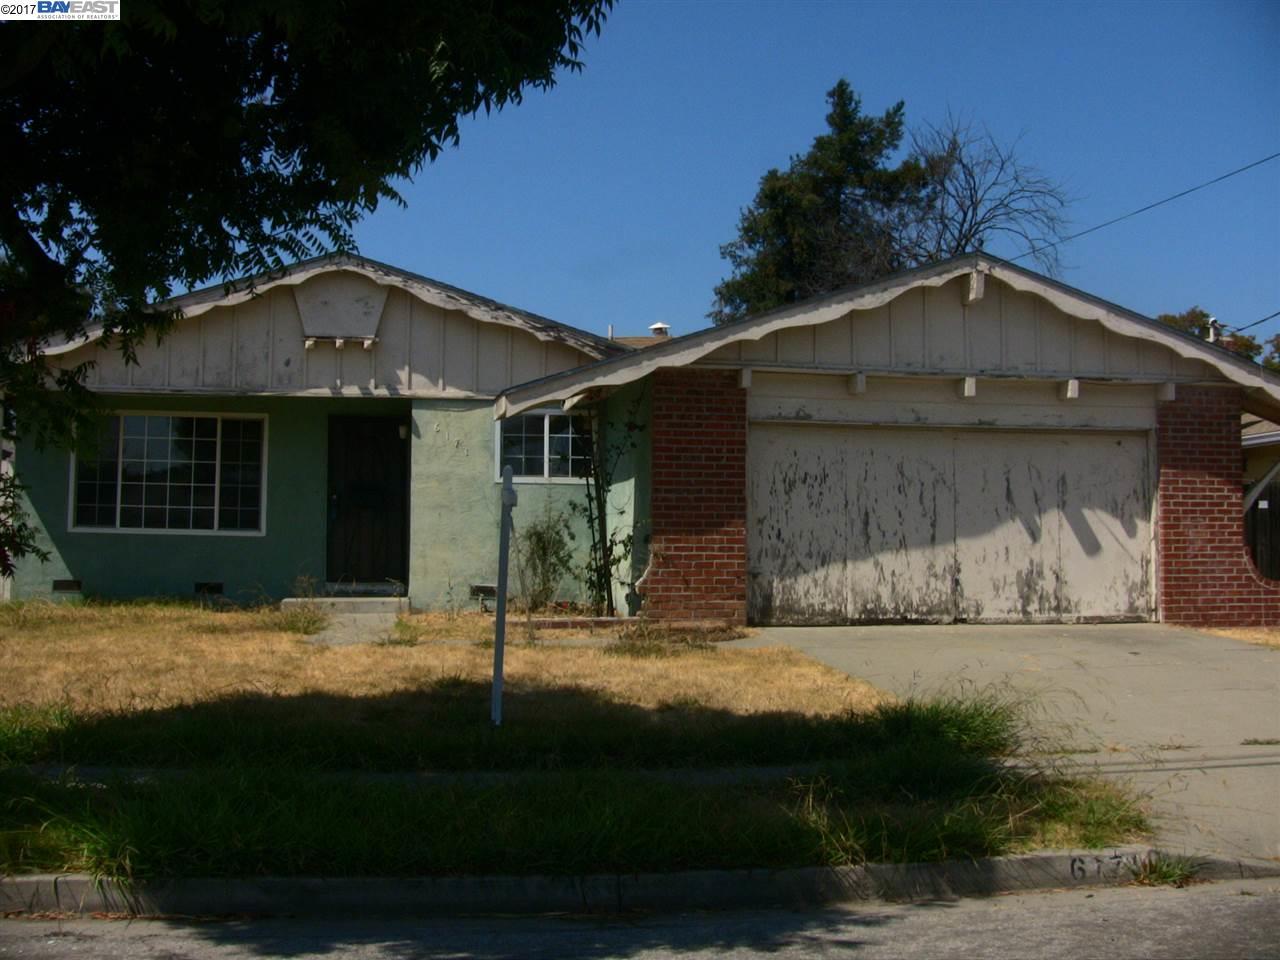 6171 Marguerite Dr, NEWARK, CA 94560